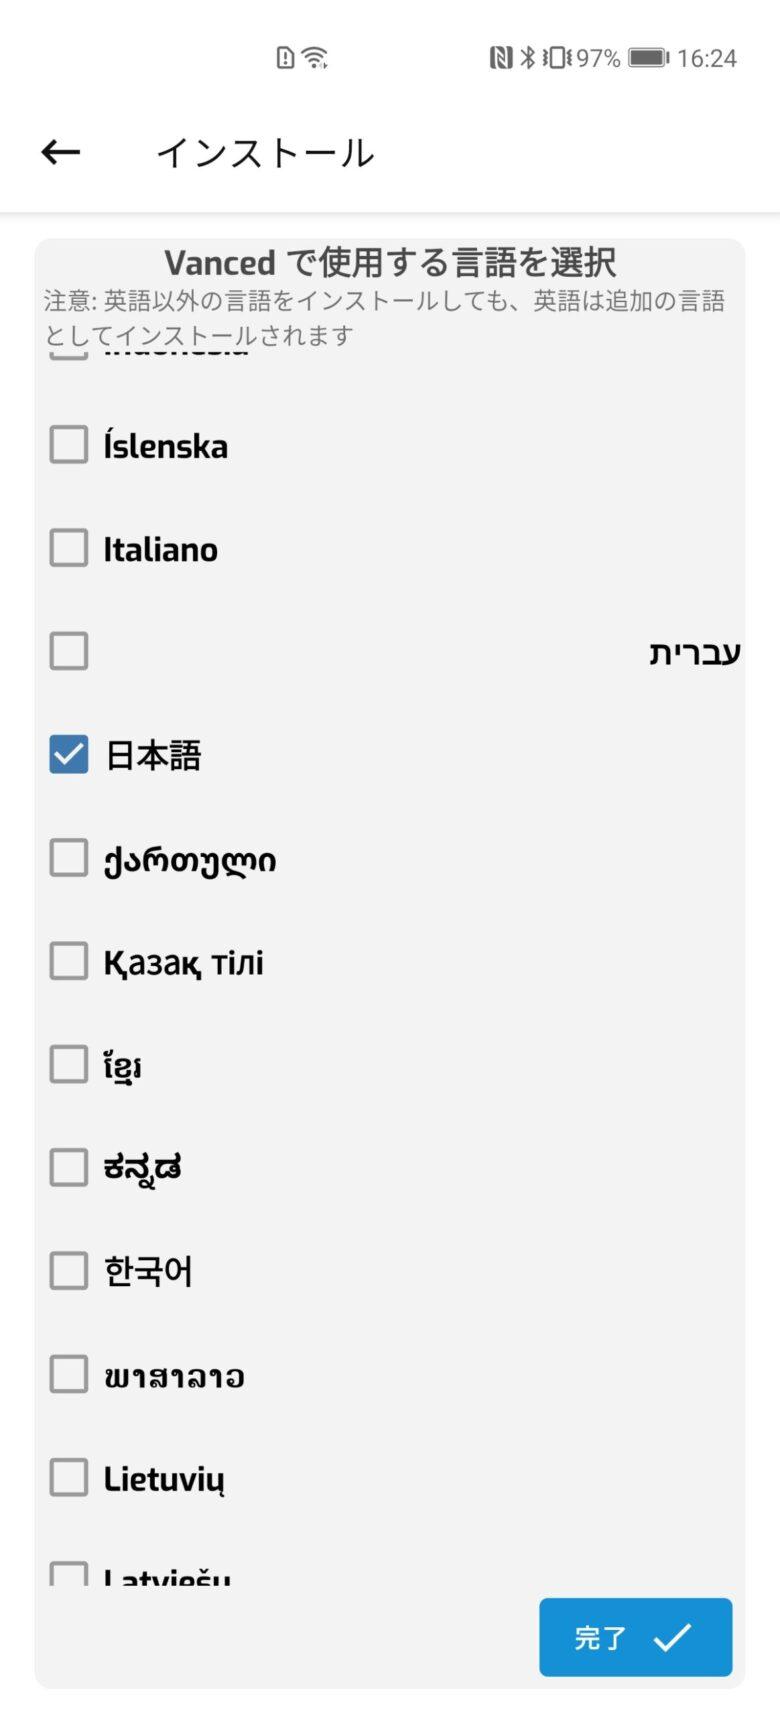 YouTube Vancedの言語選択画面です。